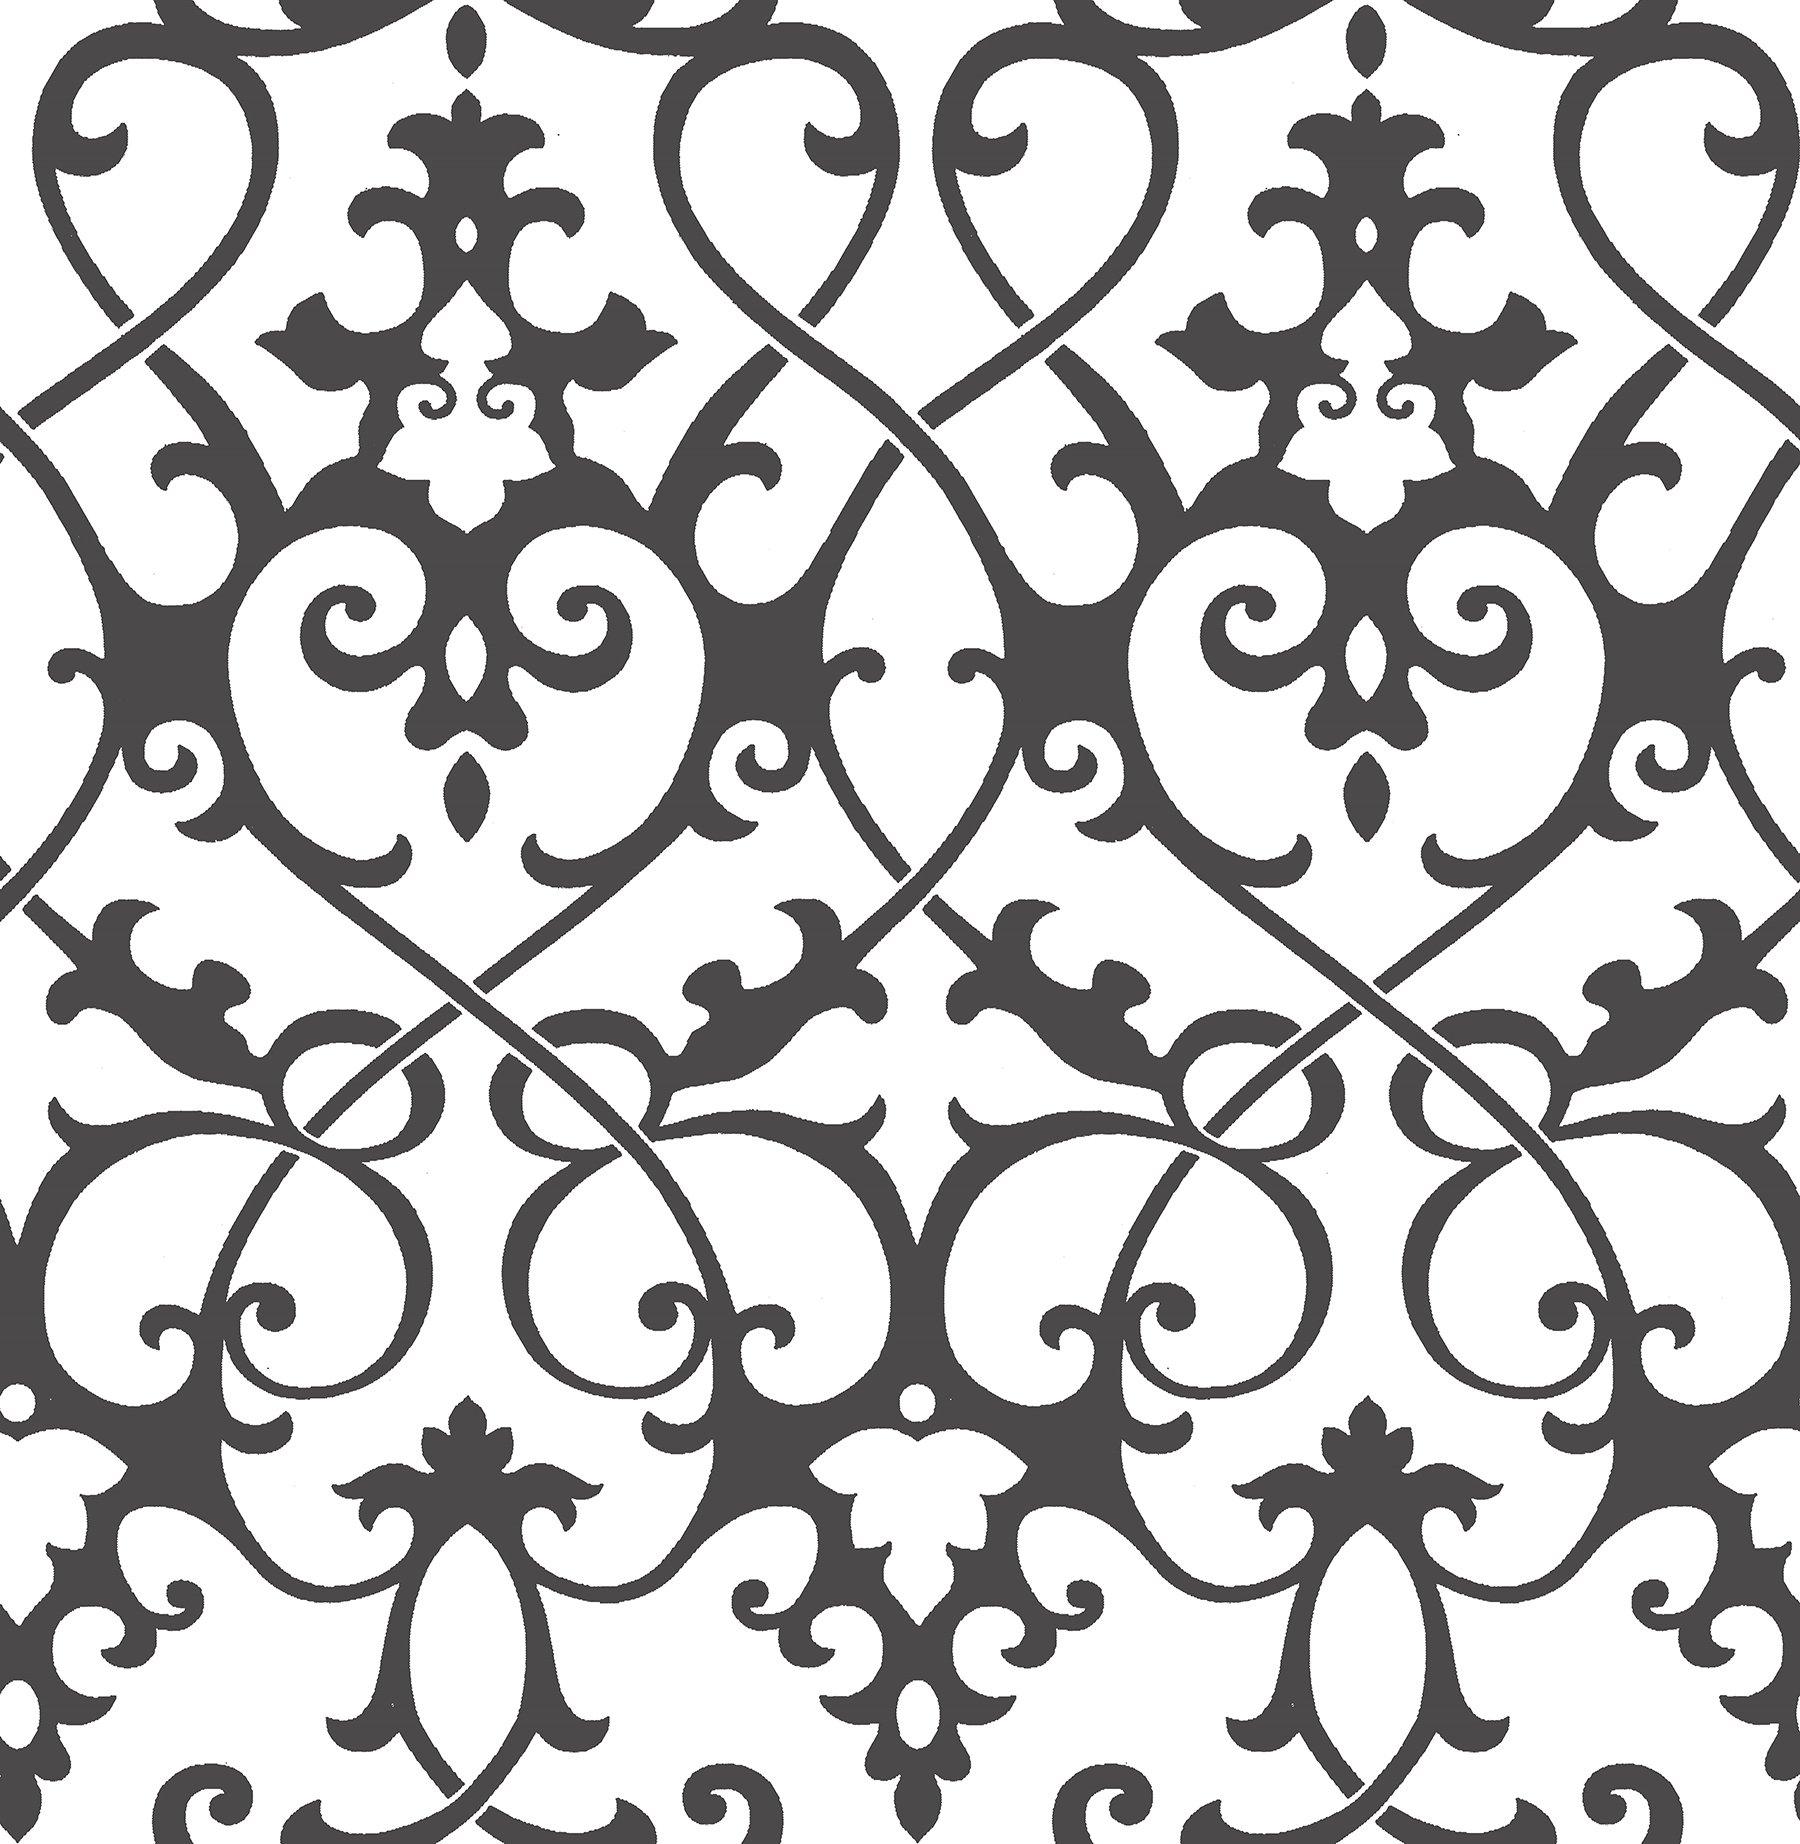 A-Street Prints 2625-21869 Axiom Ironwork Wallpaper, Black